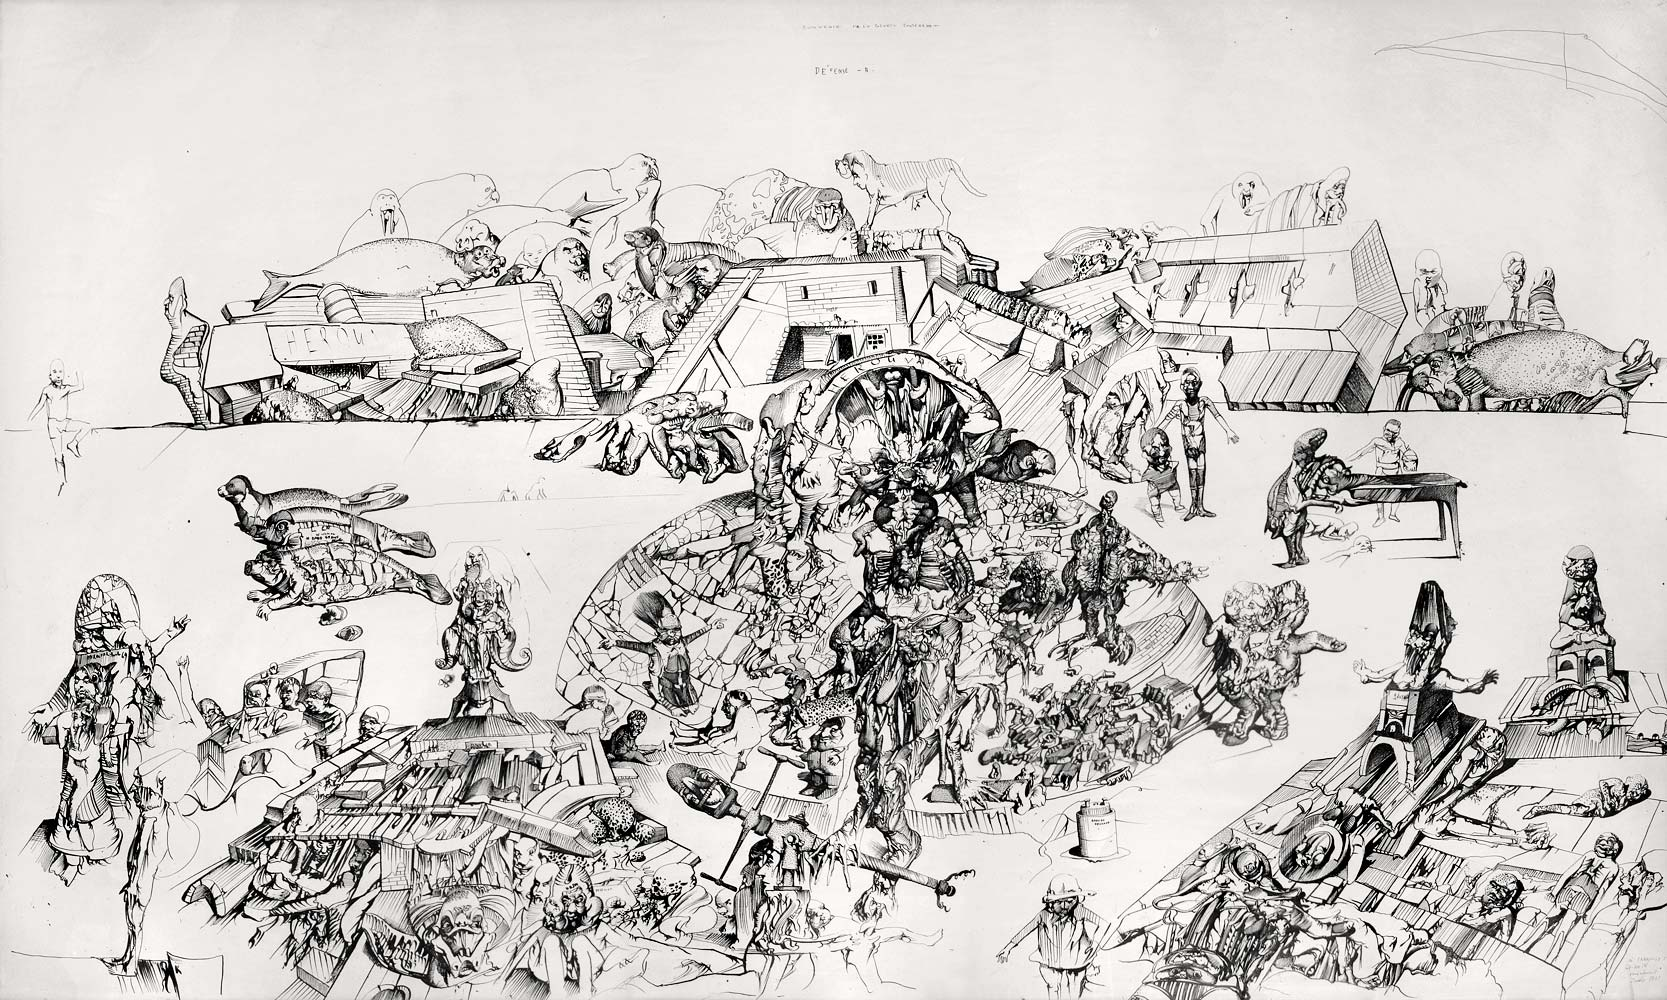 Souvenir de la guerre souterraine, 1971 - Dessin de Dado ...